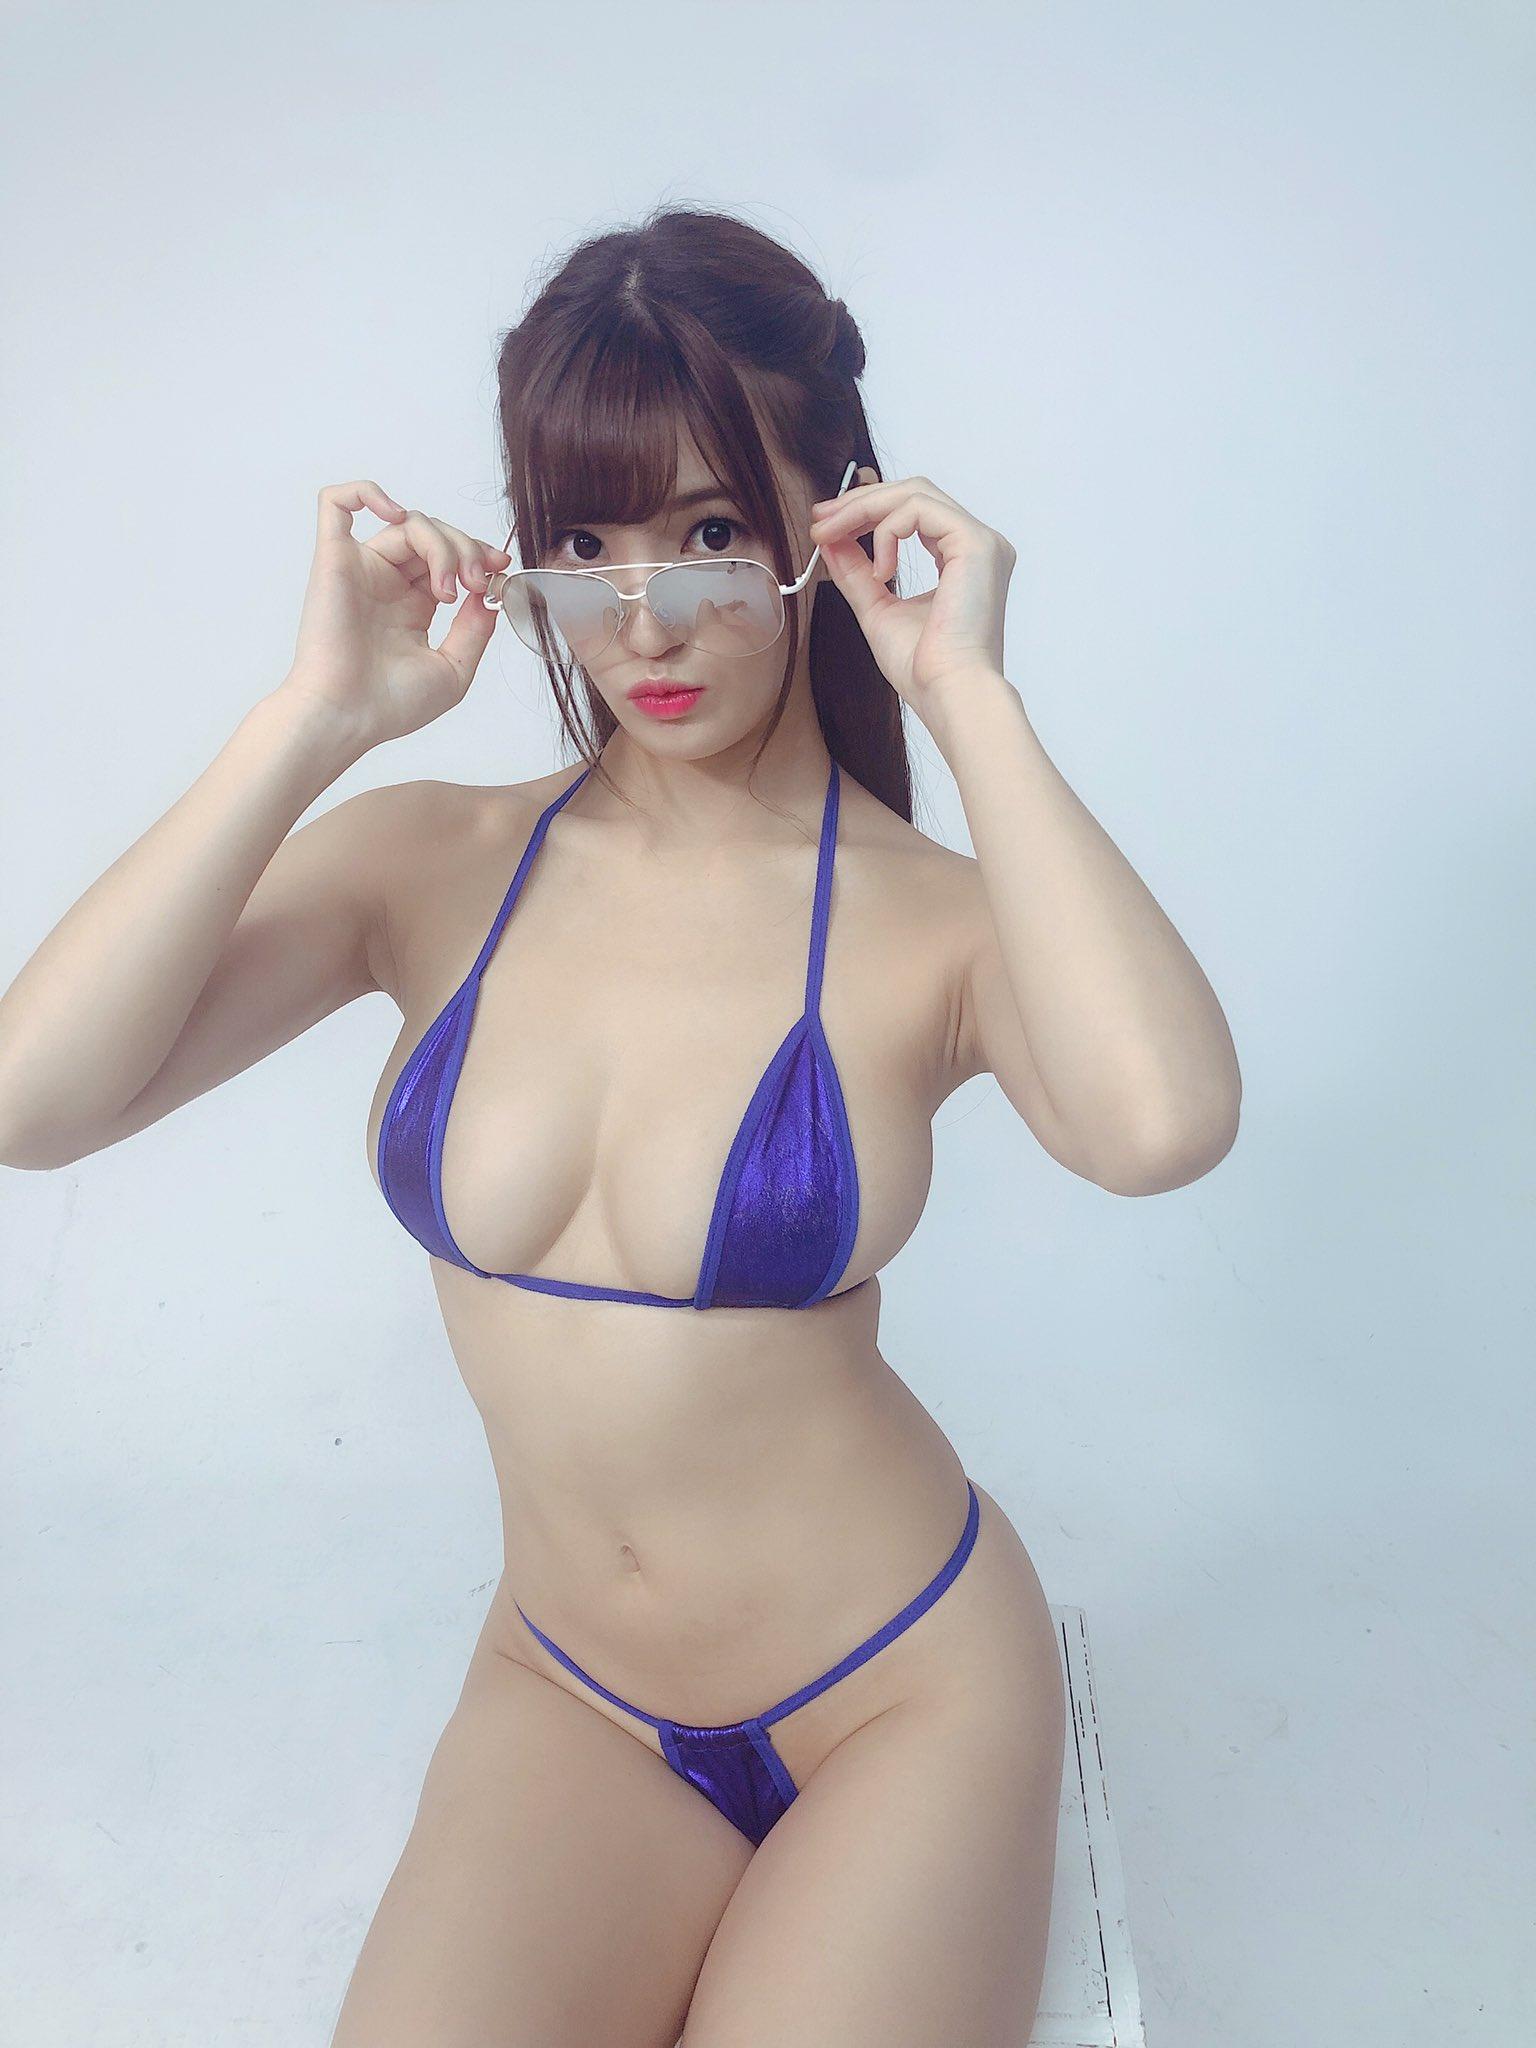 TS_takasho 1183915631420178432_p0